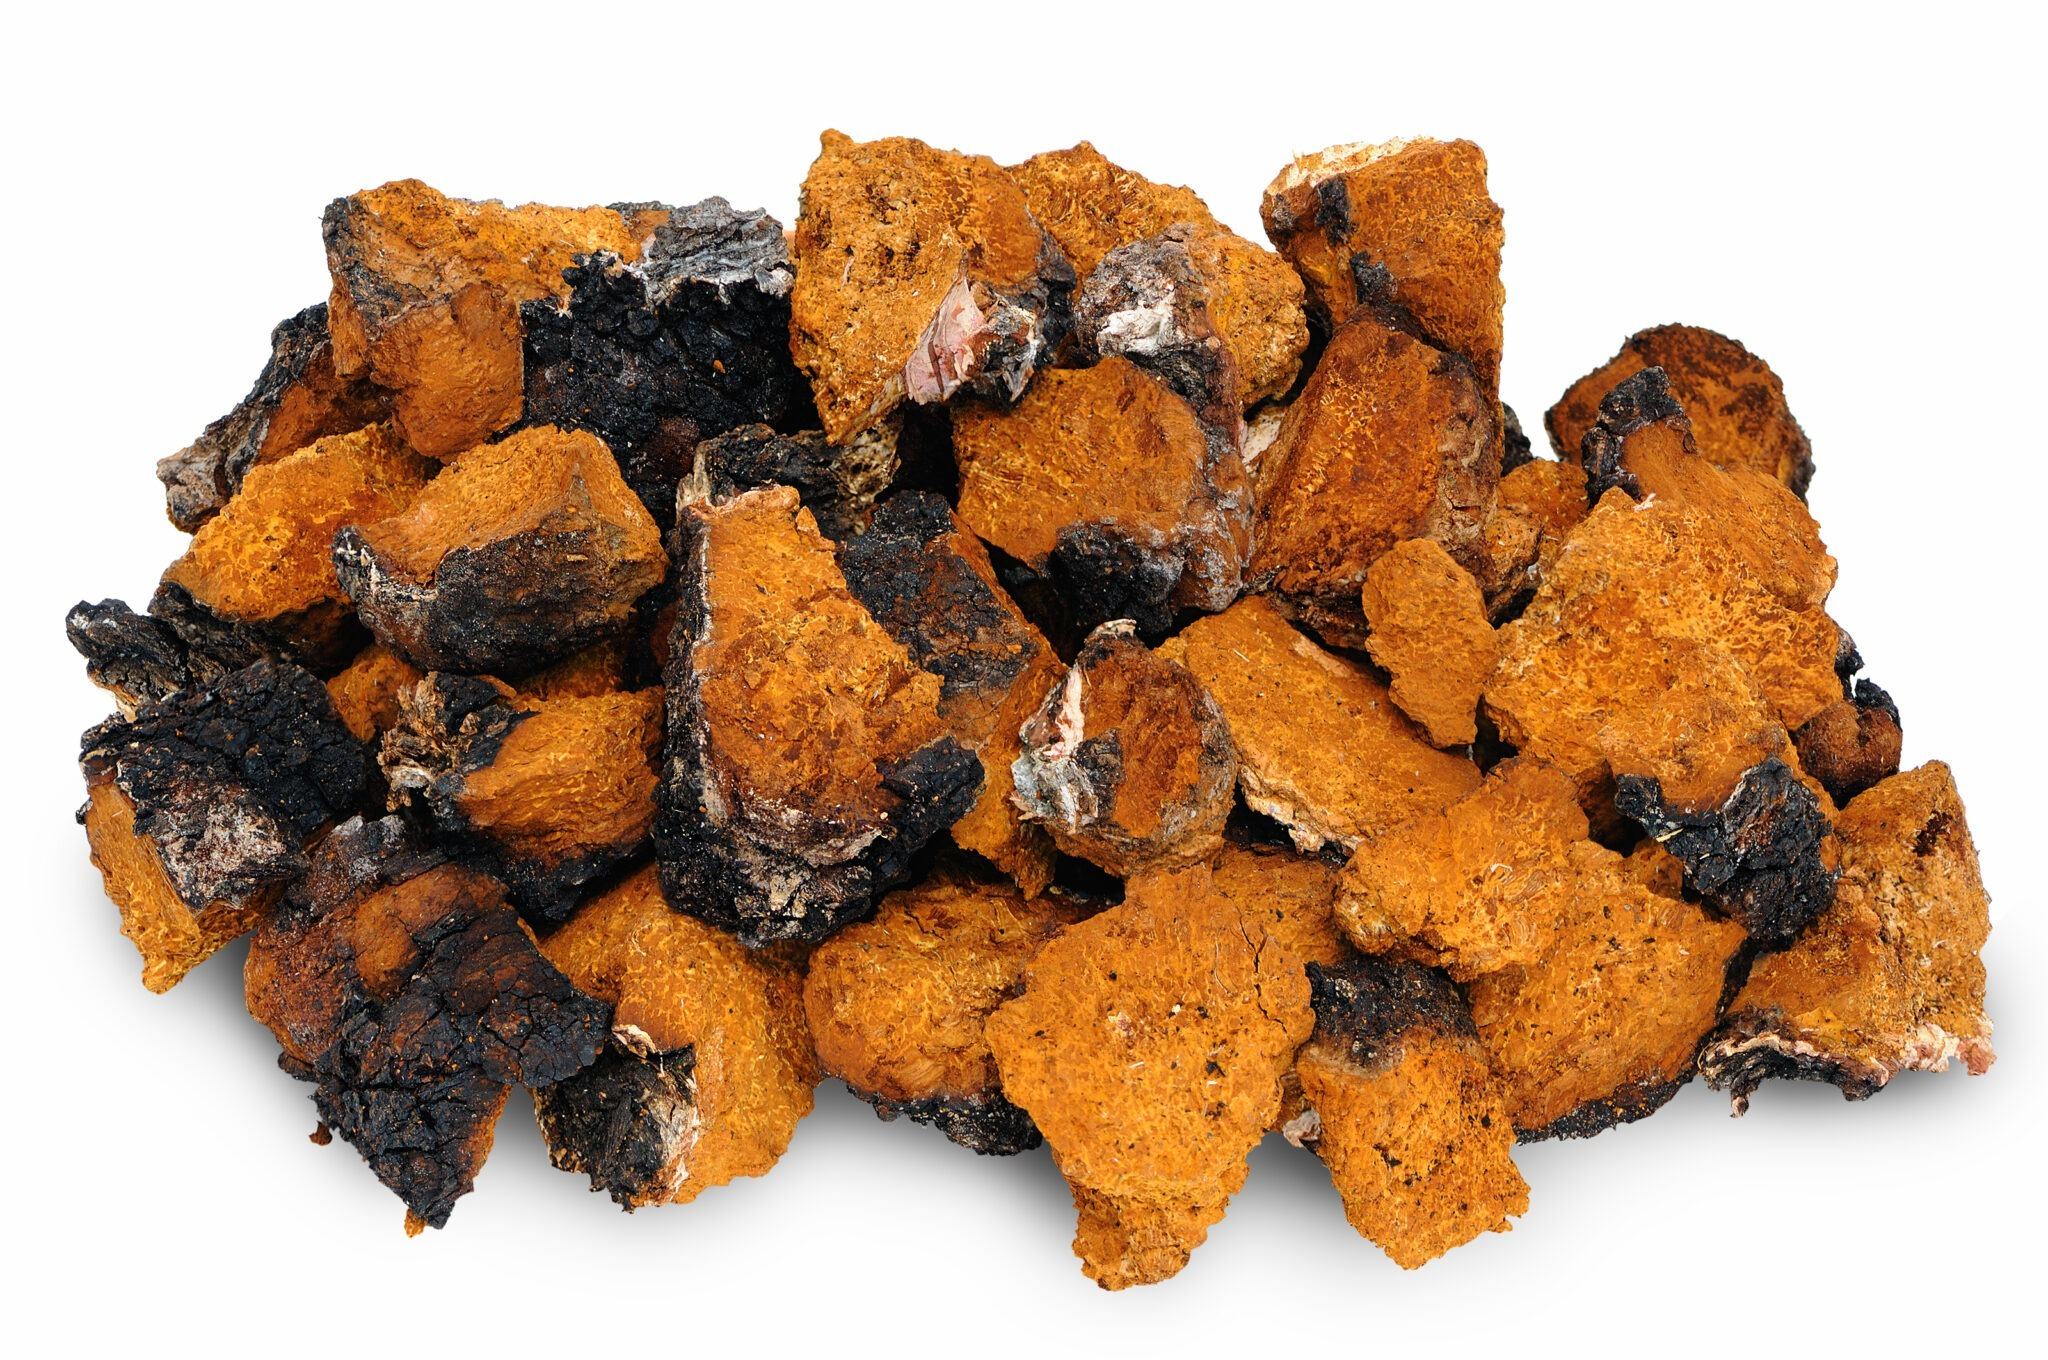 chaga mushroom health benefits and side effects